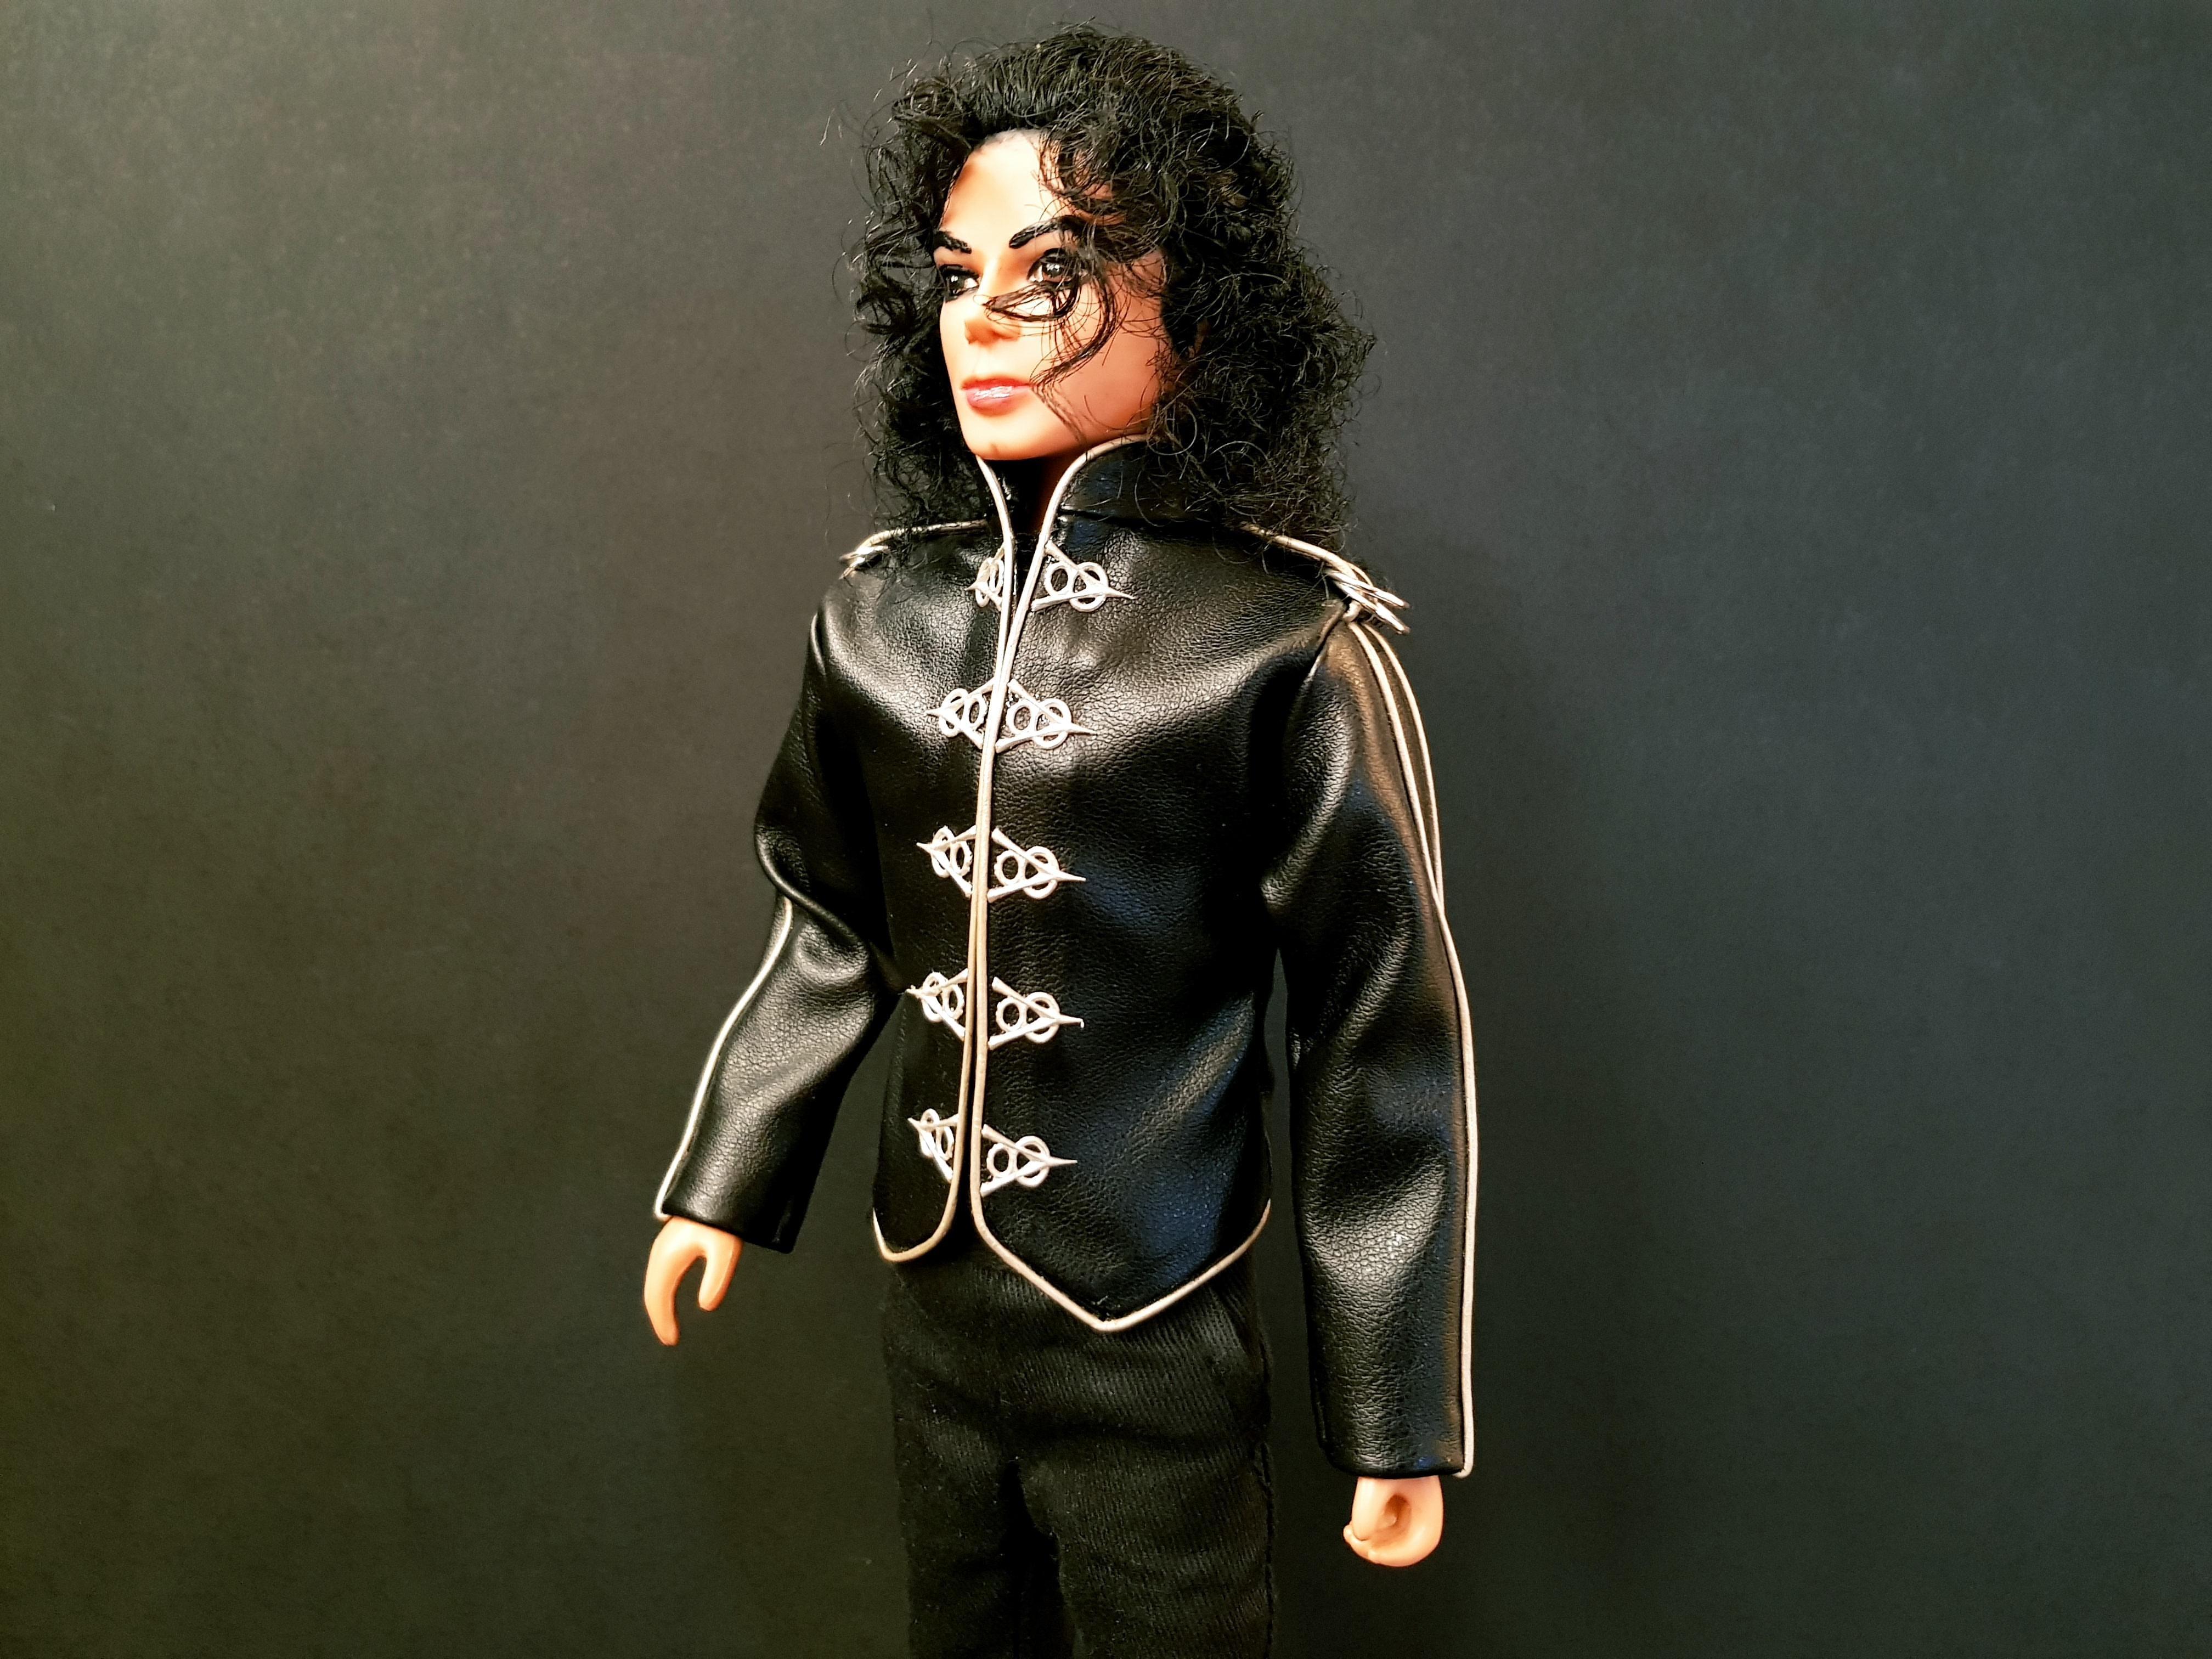 Michael Jackson doll V8 jacket close up